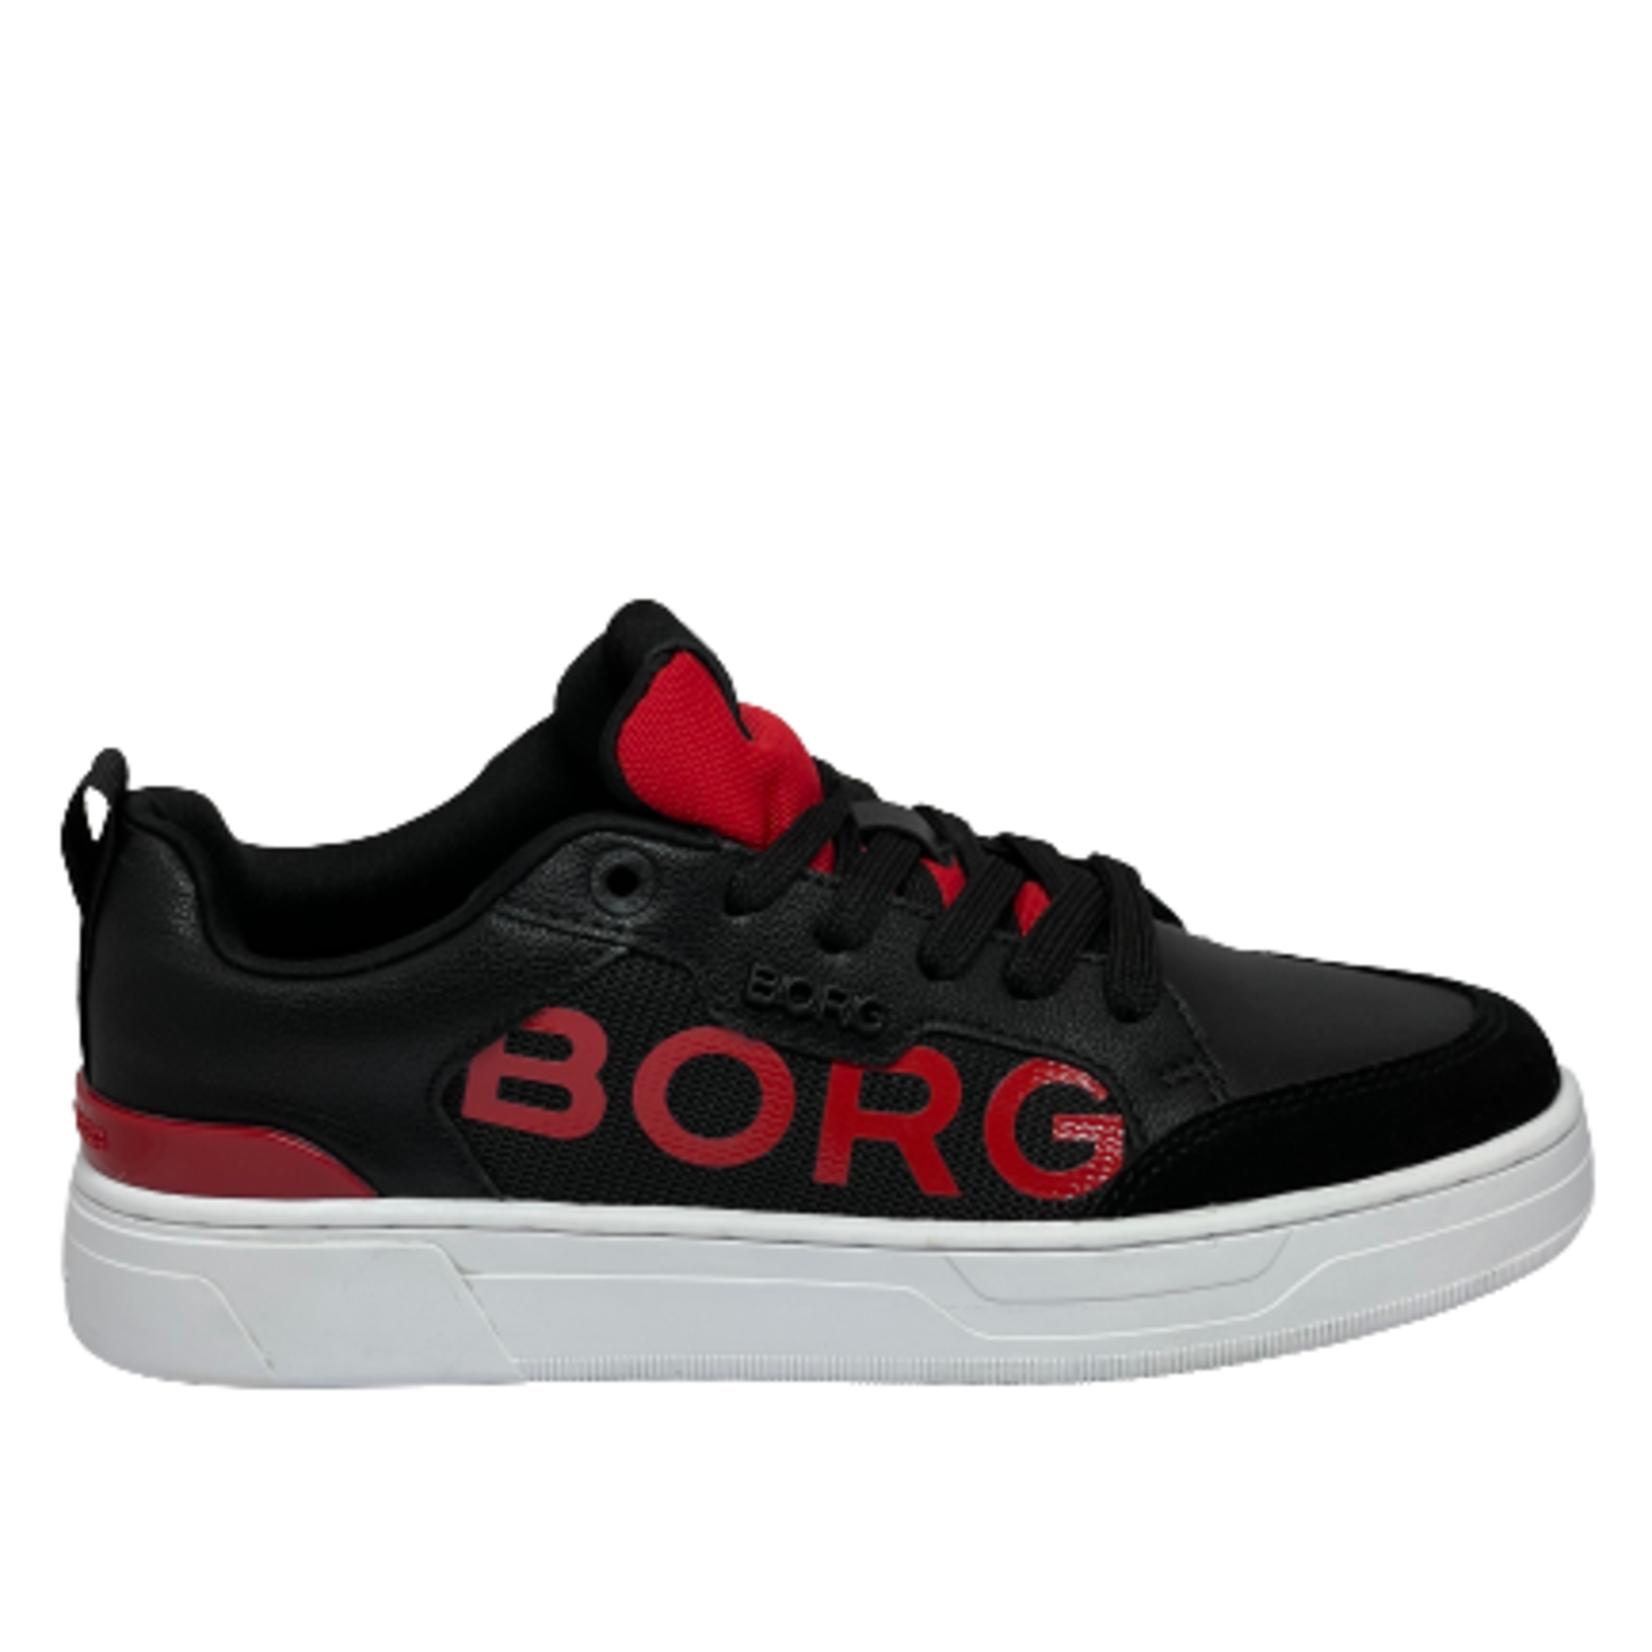 Björn Borg Björn Borg T1060 LGO T Rood